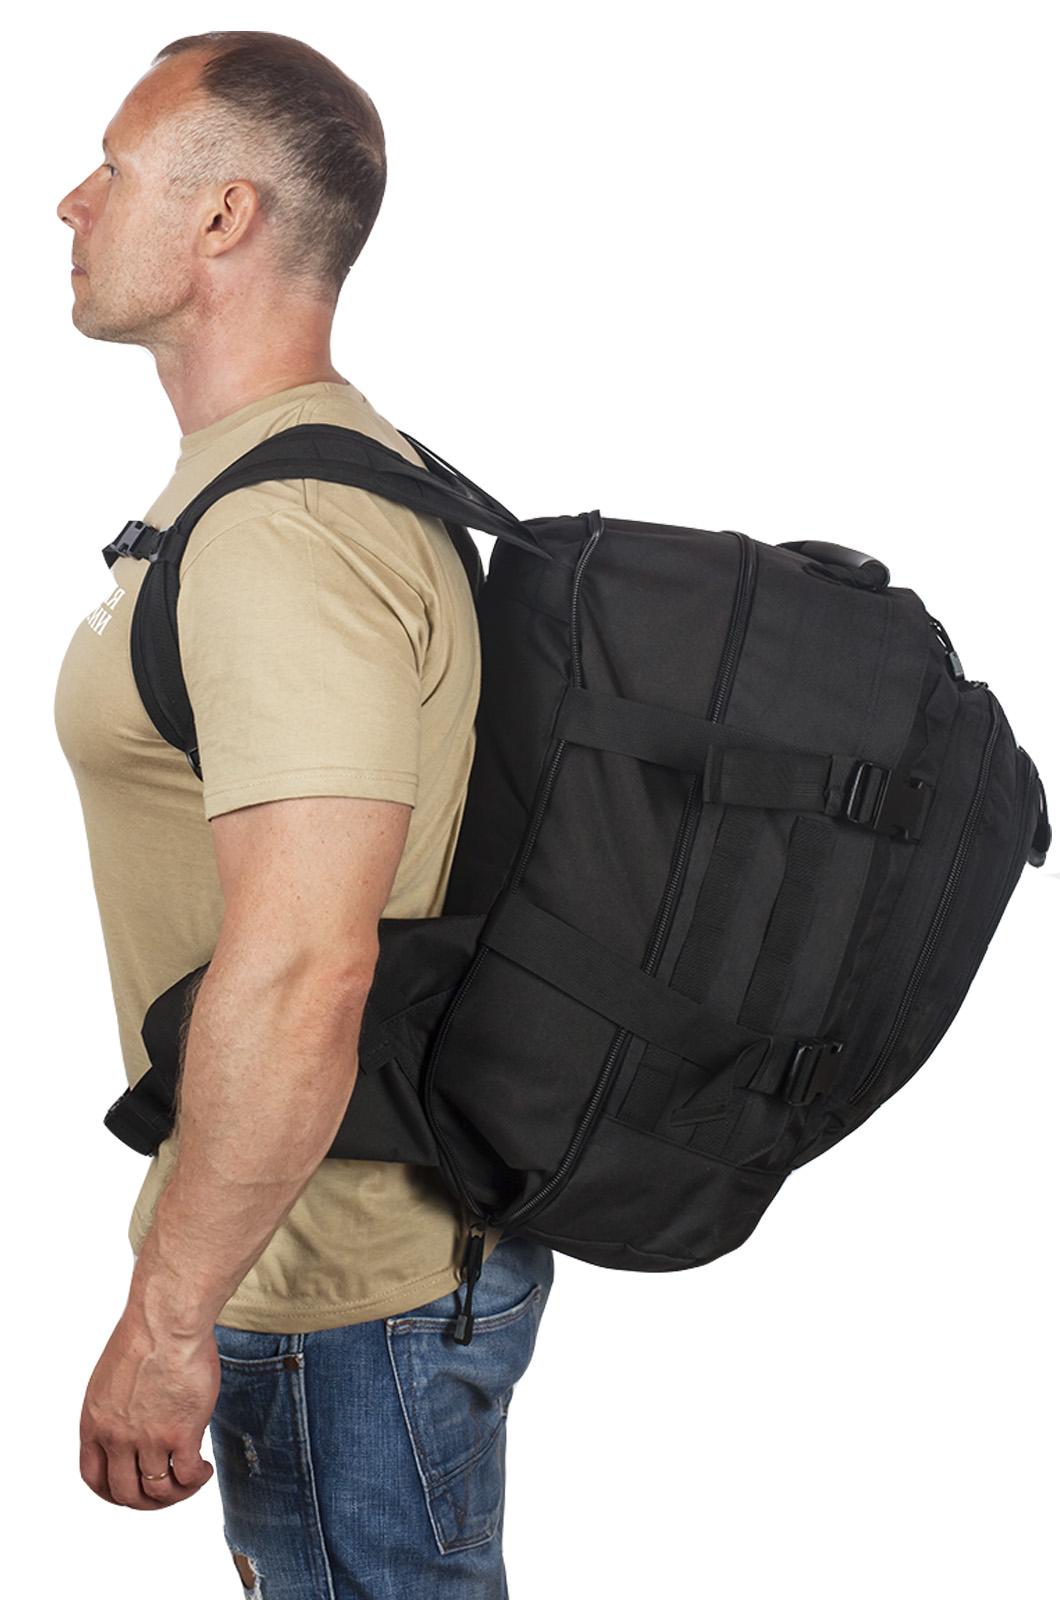 Черный армейский рюкзак 3-Day Expandable Backpack 08002A Black с эмблемой СССР